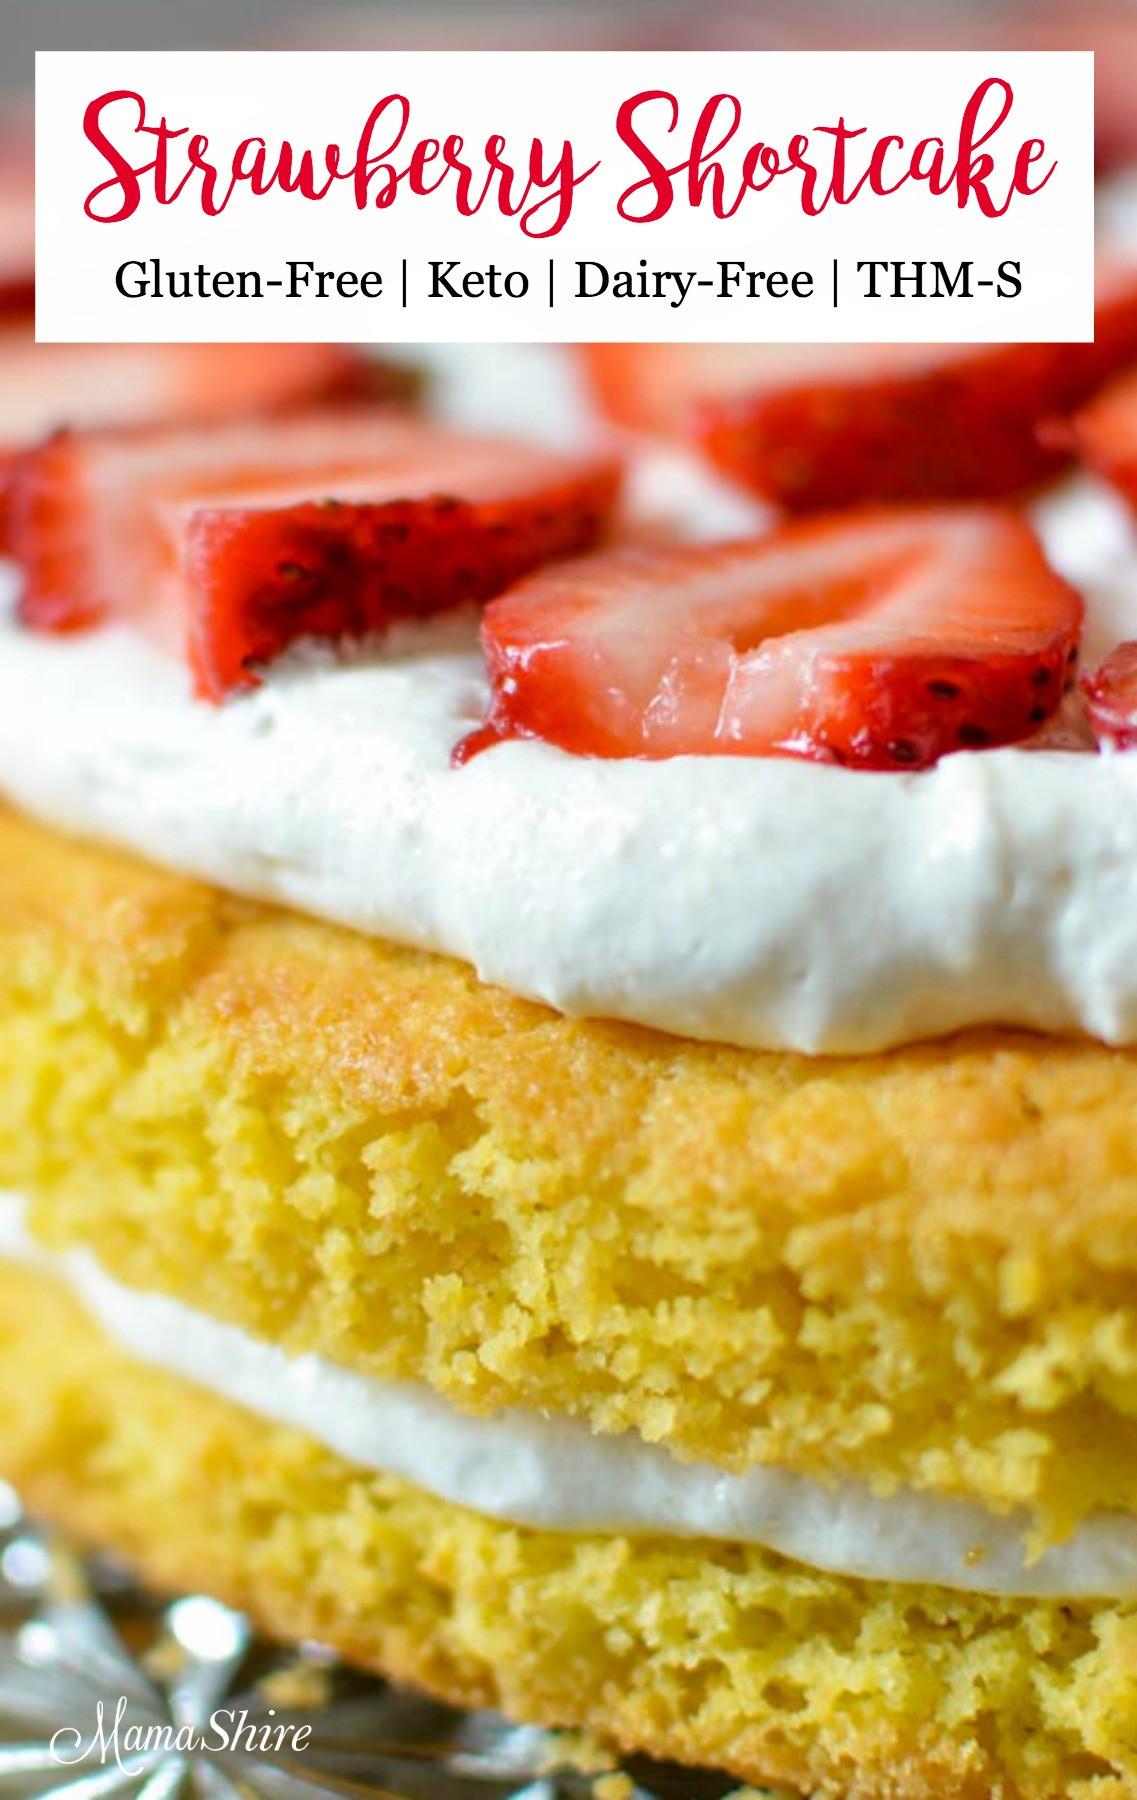 Dairy Free Keto Recipes  Gluten Free Strawberry Shortcake Dairy free MamaShire